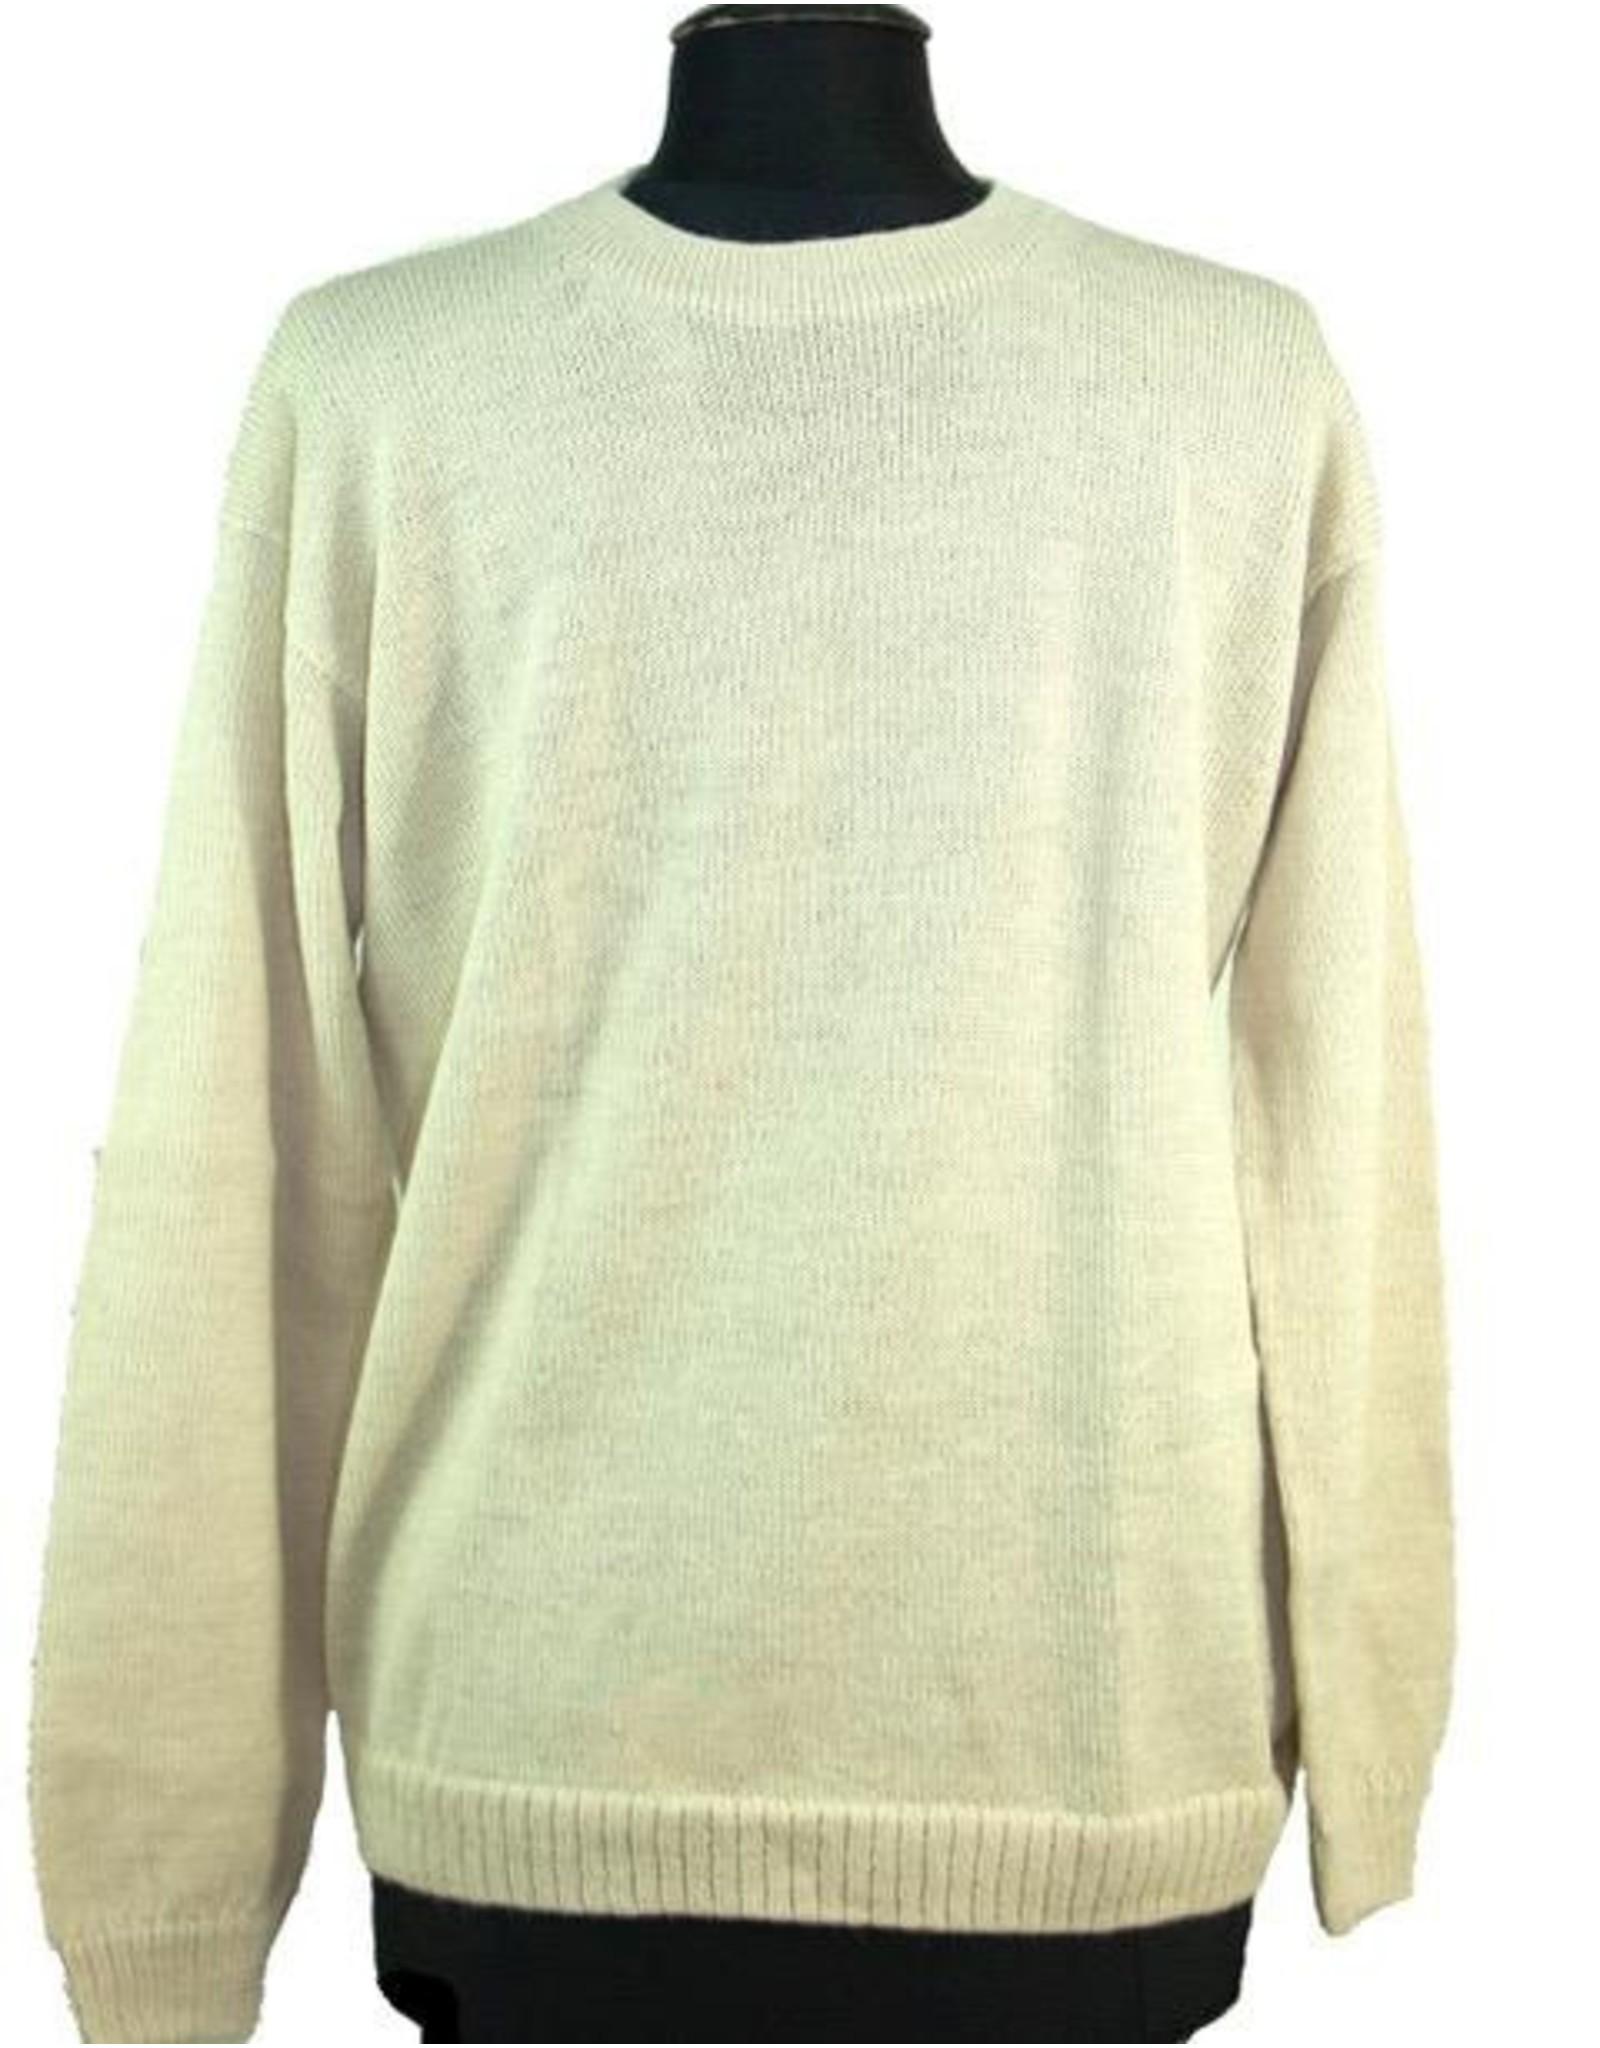 Men's Crewneck Pullover